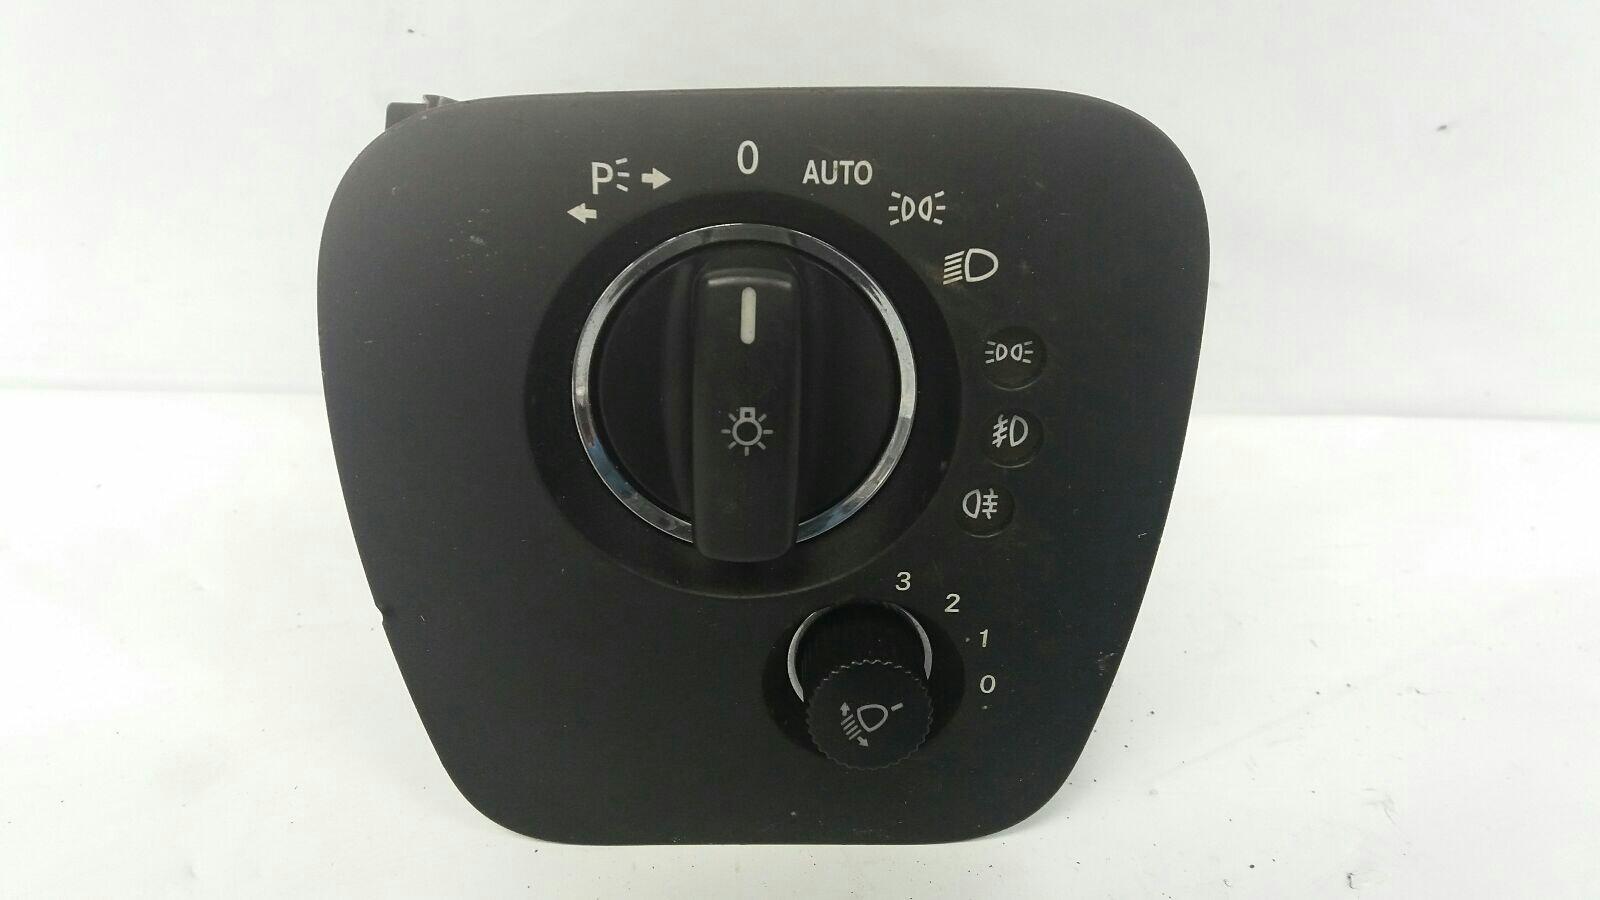 Mercedes-Benz CLS Class 2005 To 2011 CLS 320 CDi Switch Headlamp